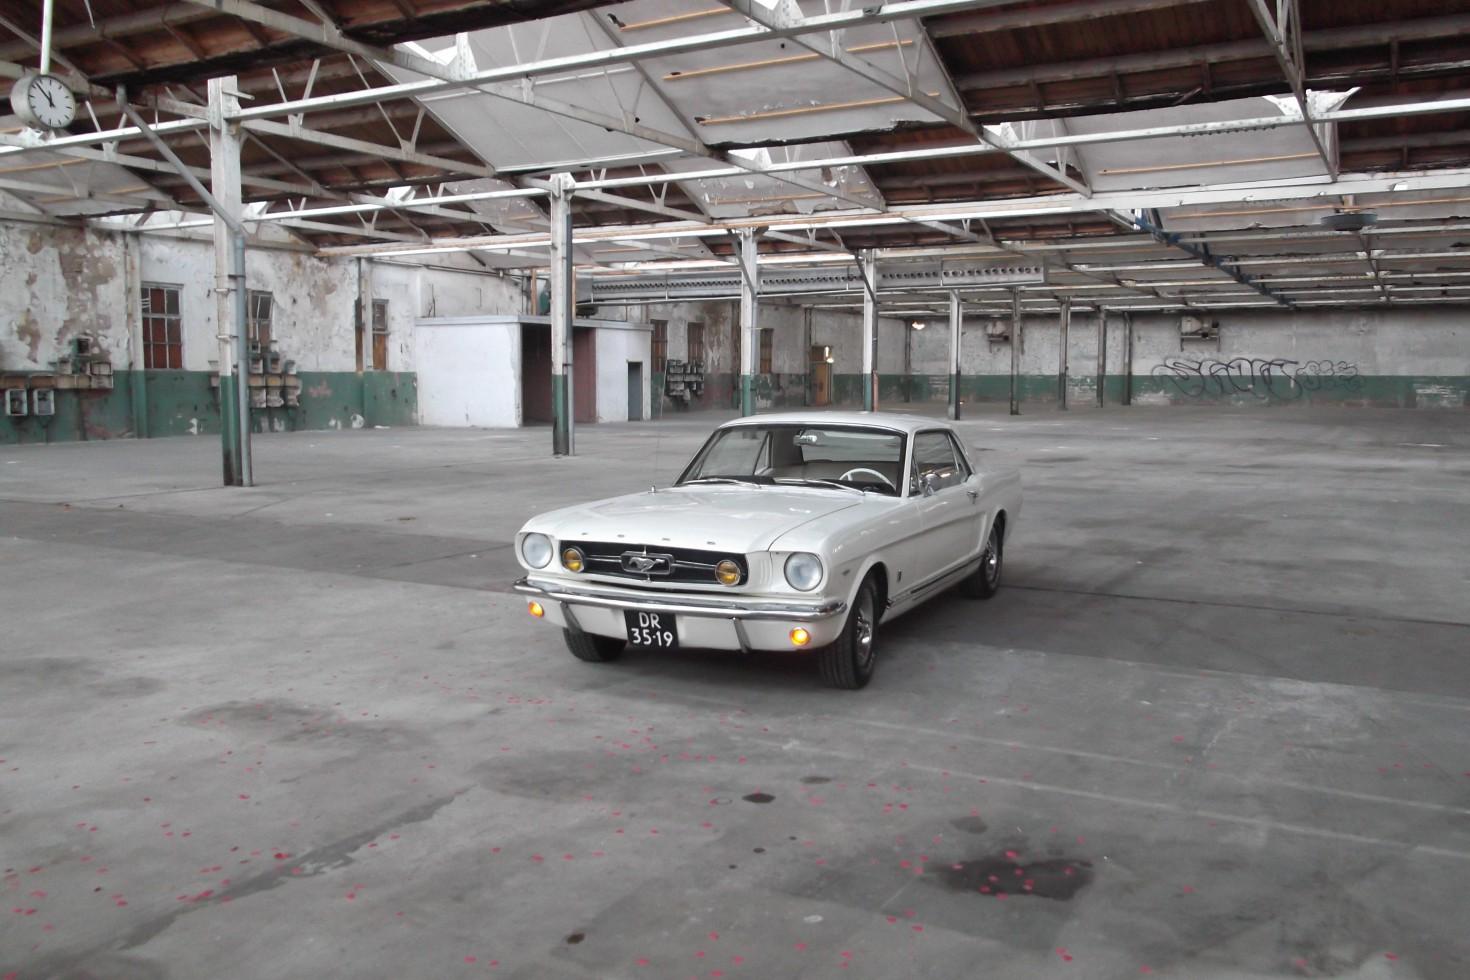 Ford Mustang huren als trouwauto